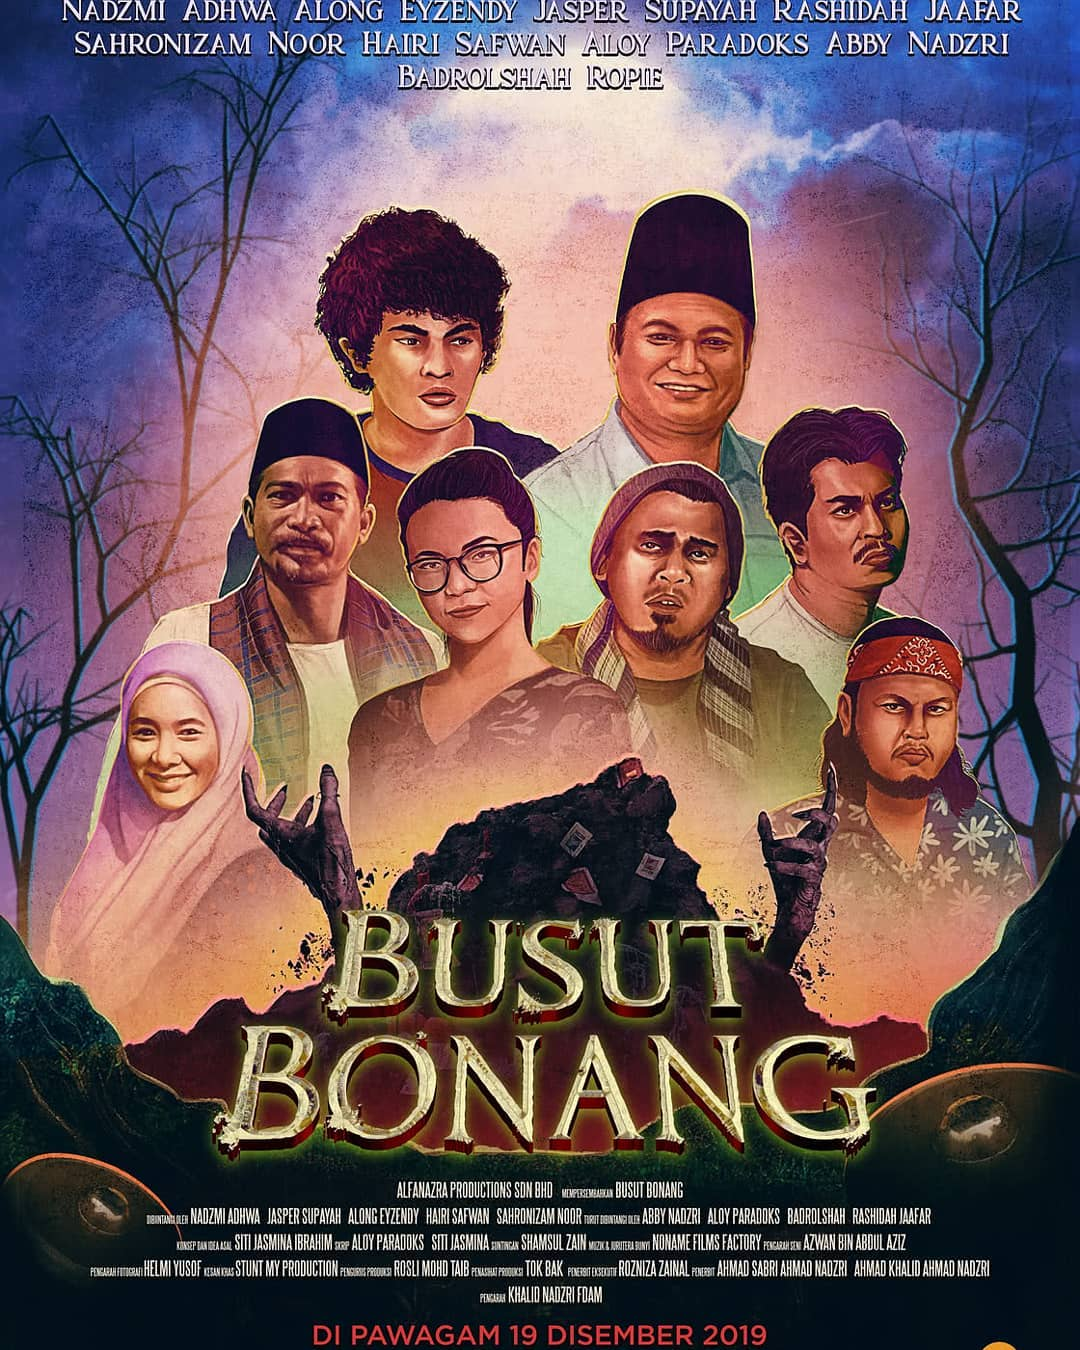 Filem Busut Bonang lakonan Nadzmi Adhwa dan Along Eyzendy